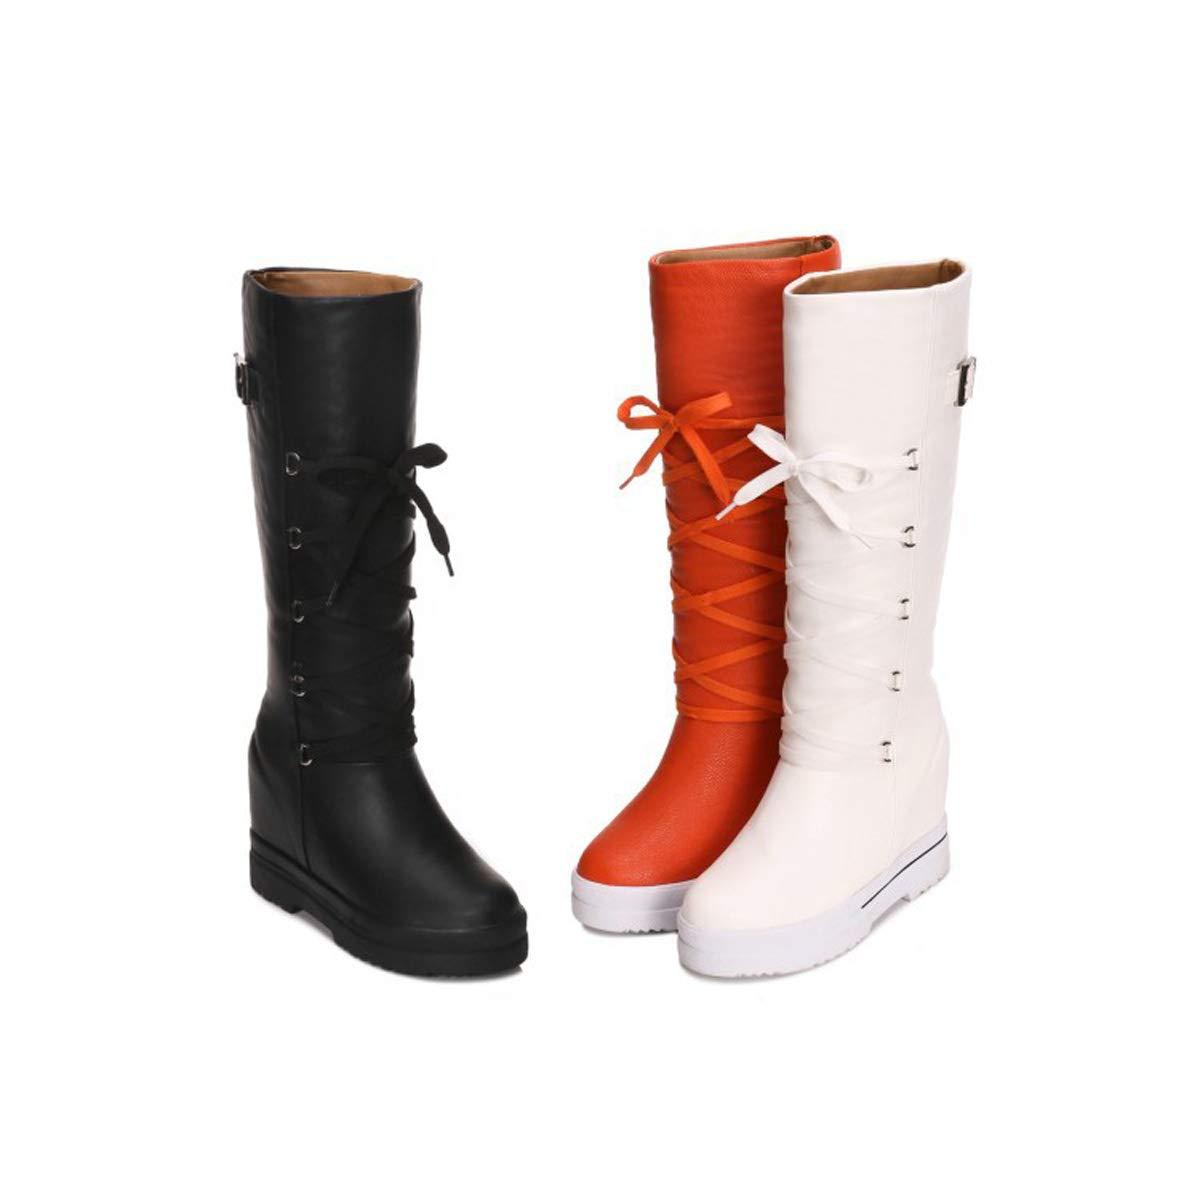 DANDANJIE Damen Schnee Stiefel Winter warme mittlere Wade Stiefel Stiefel Stiefel Damen Lace-up Keilabsatz Schuhe Stiefel,A,39EU 0113b9